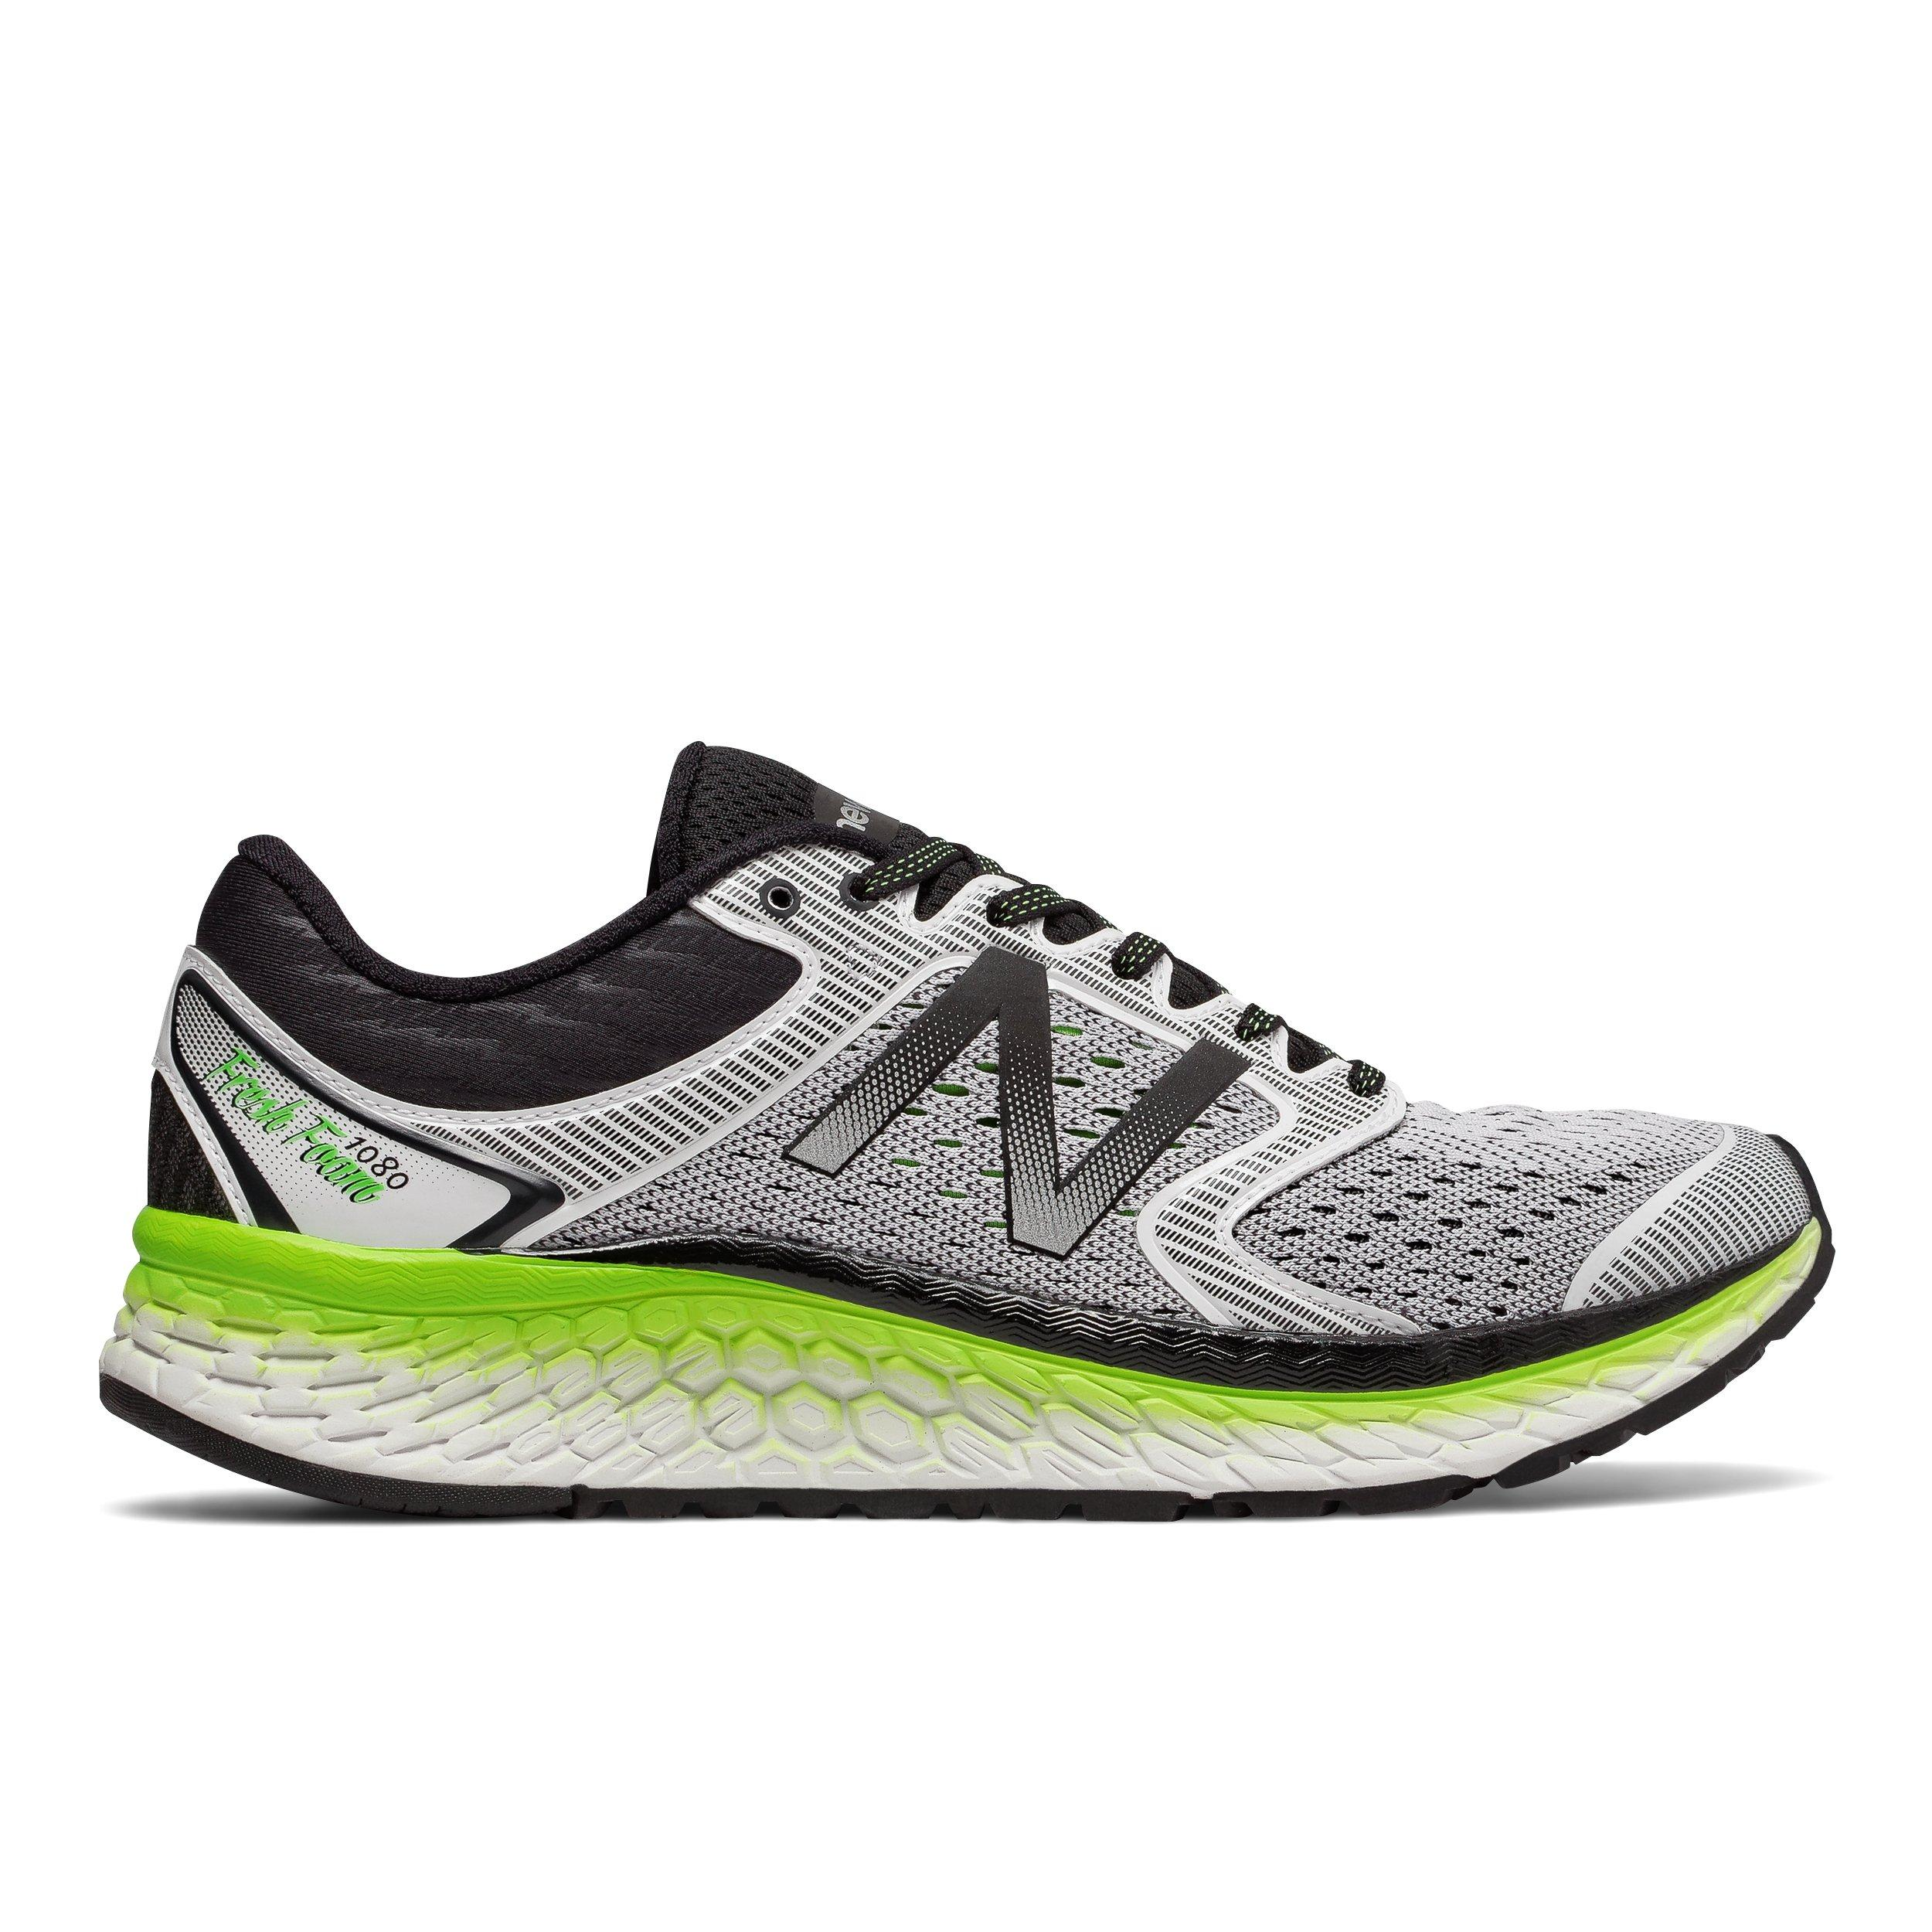 New Balance Fresh Foam 1080v7 Men's Running Shoe - Hibbett | City Gear